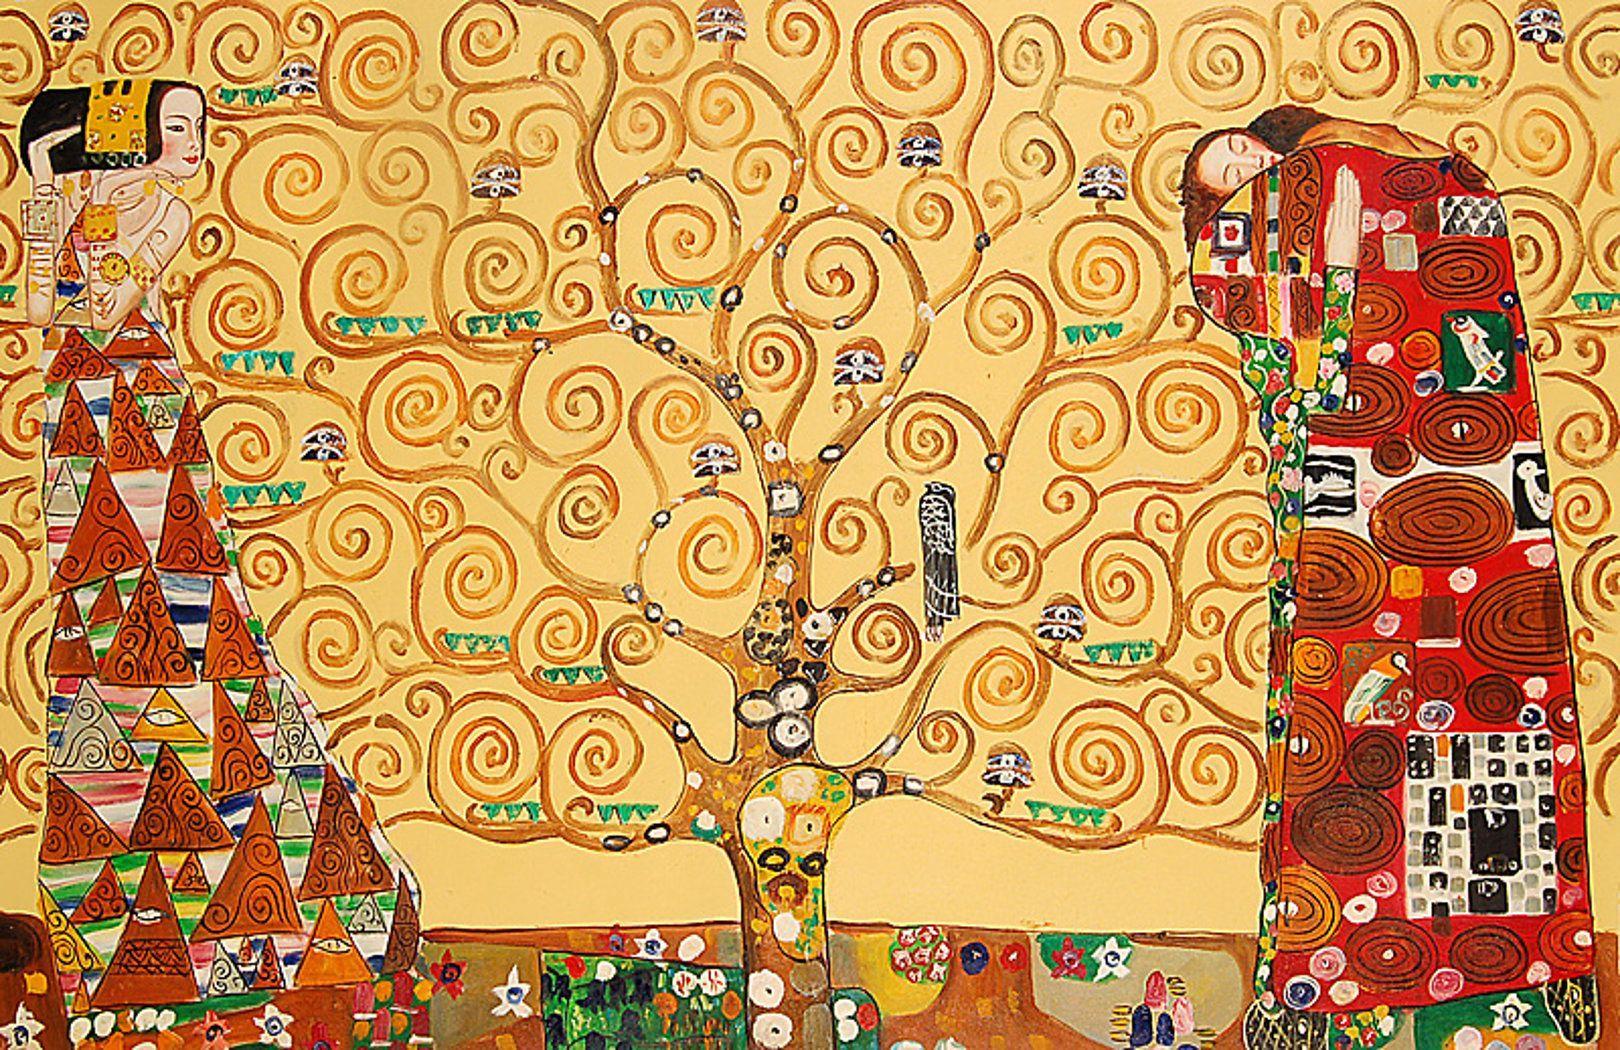 Gustav Klimt, L'albero della vita, 1905-1909